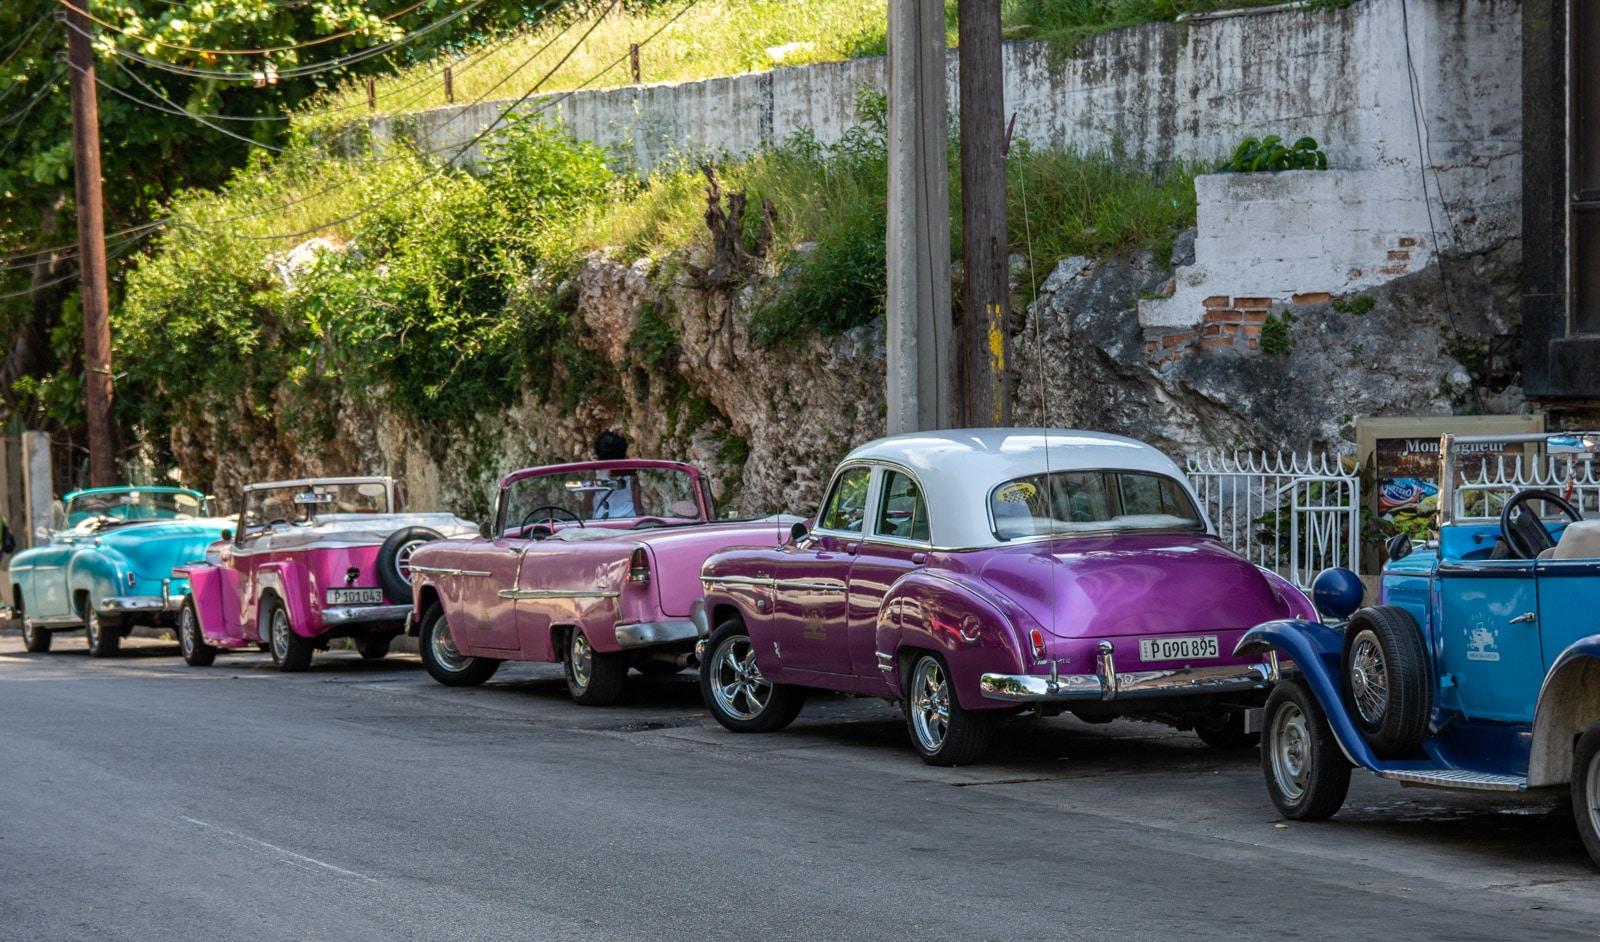 Kuba - stare samochody